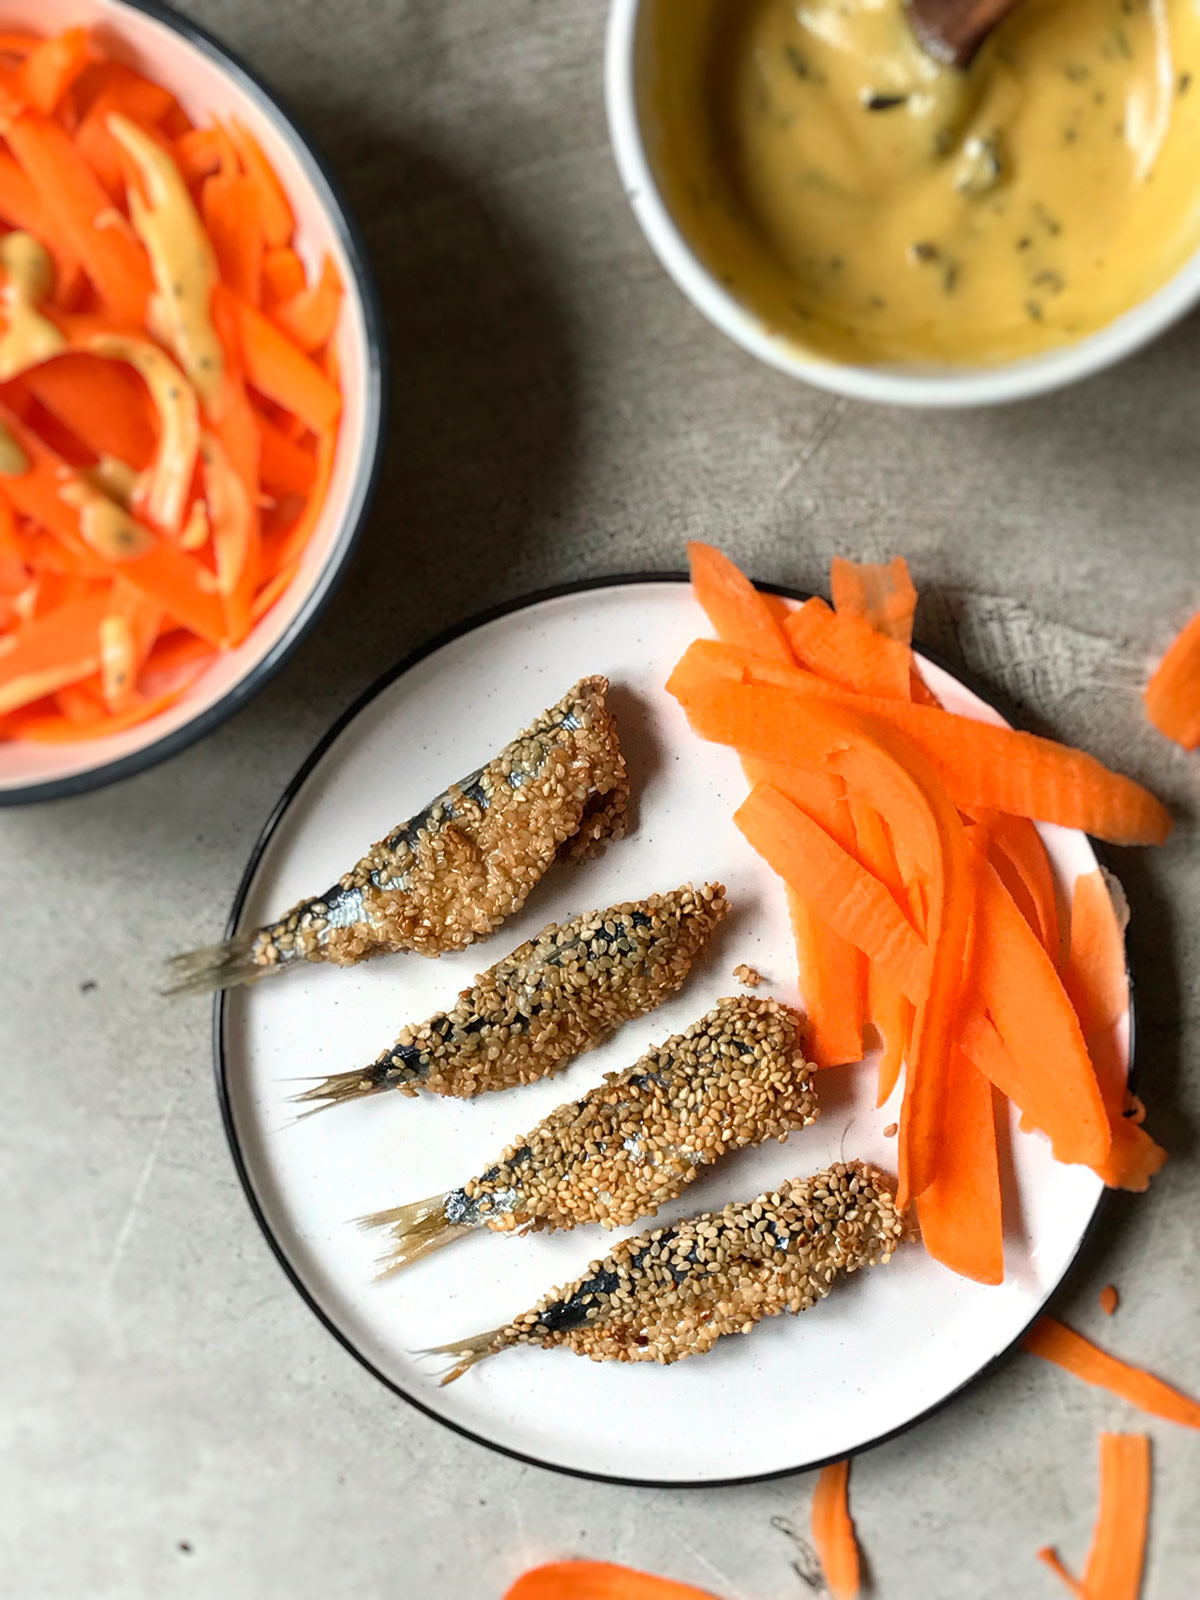 Receta de sardinas